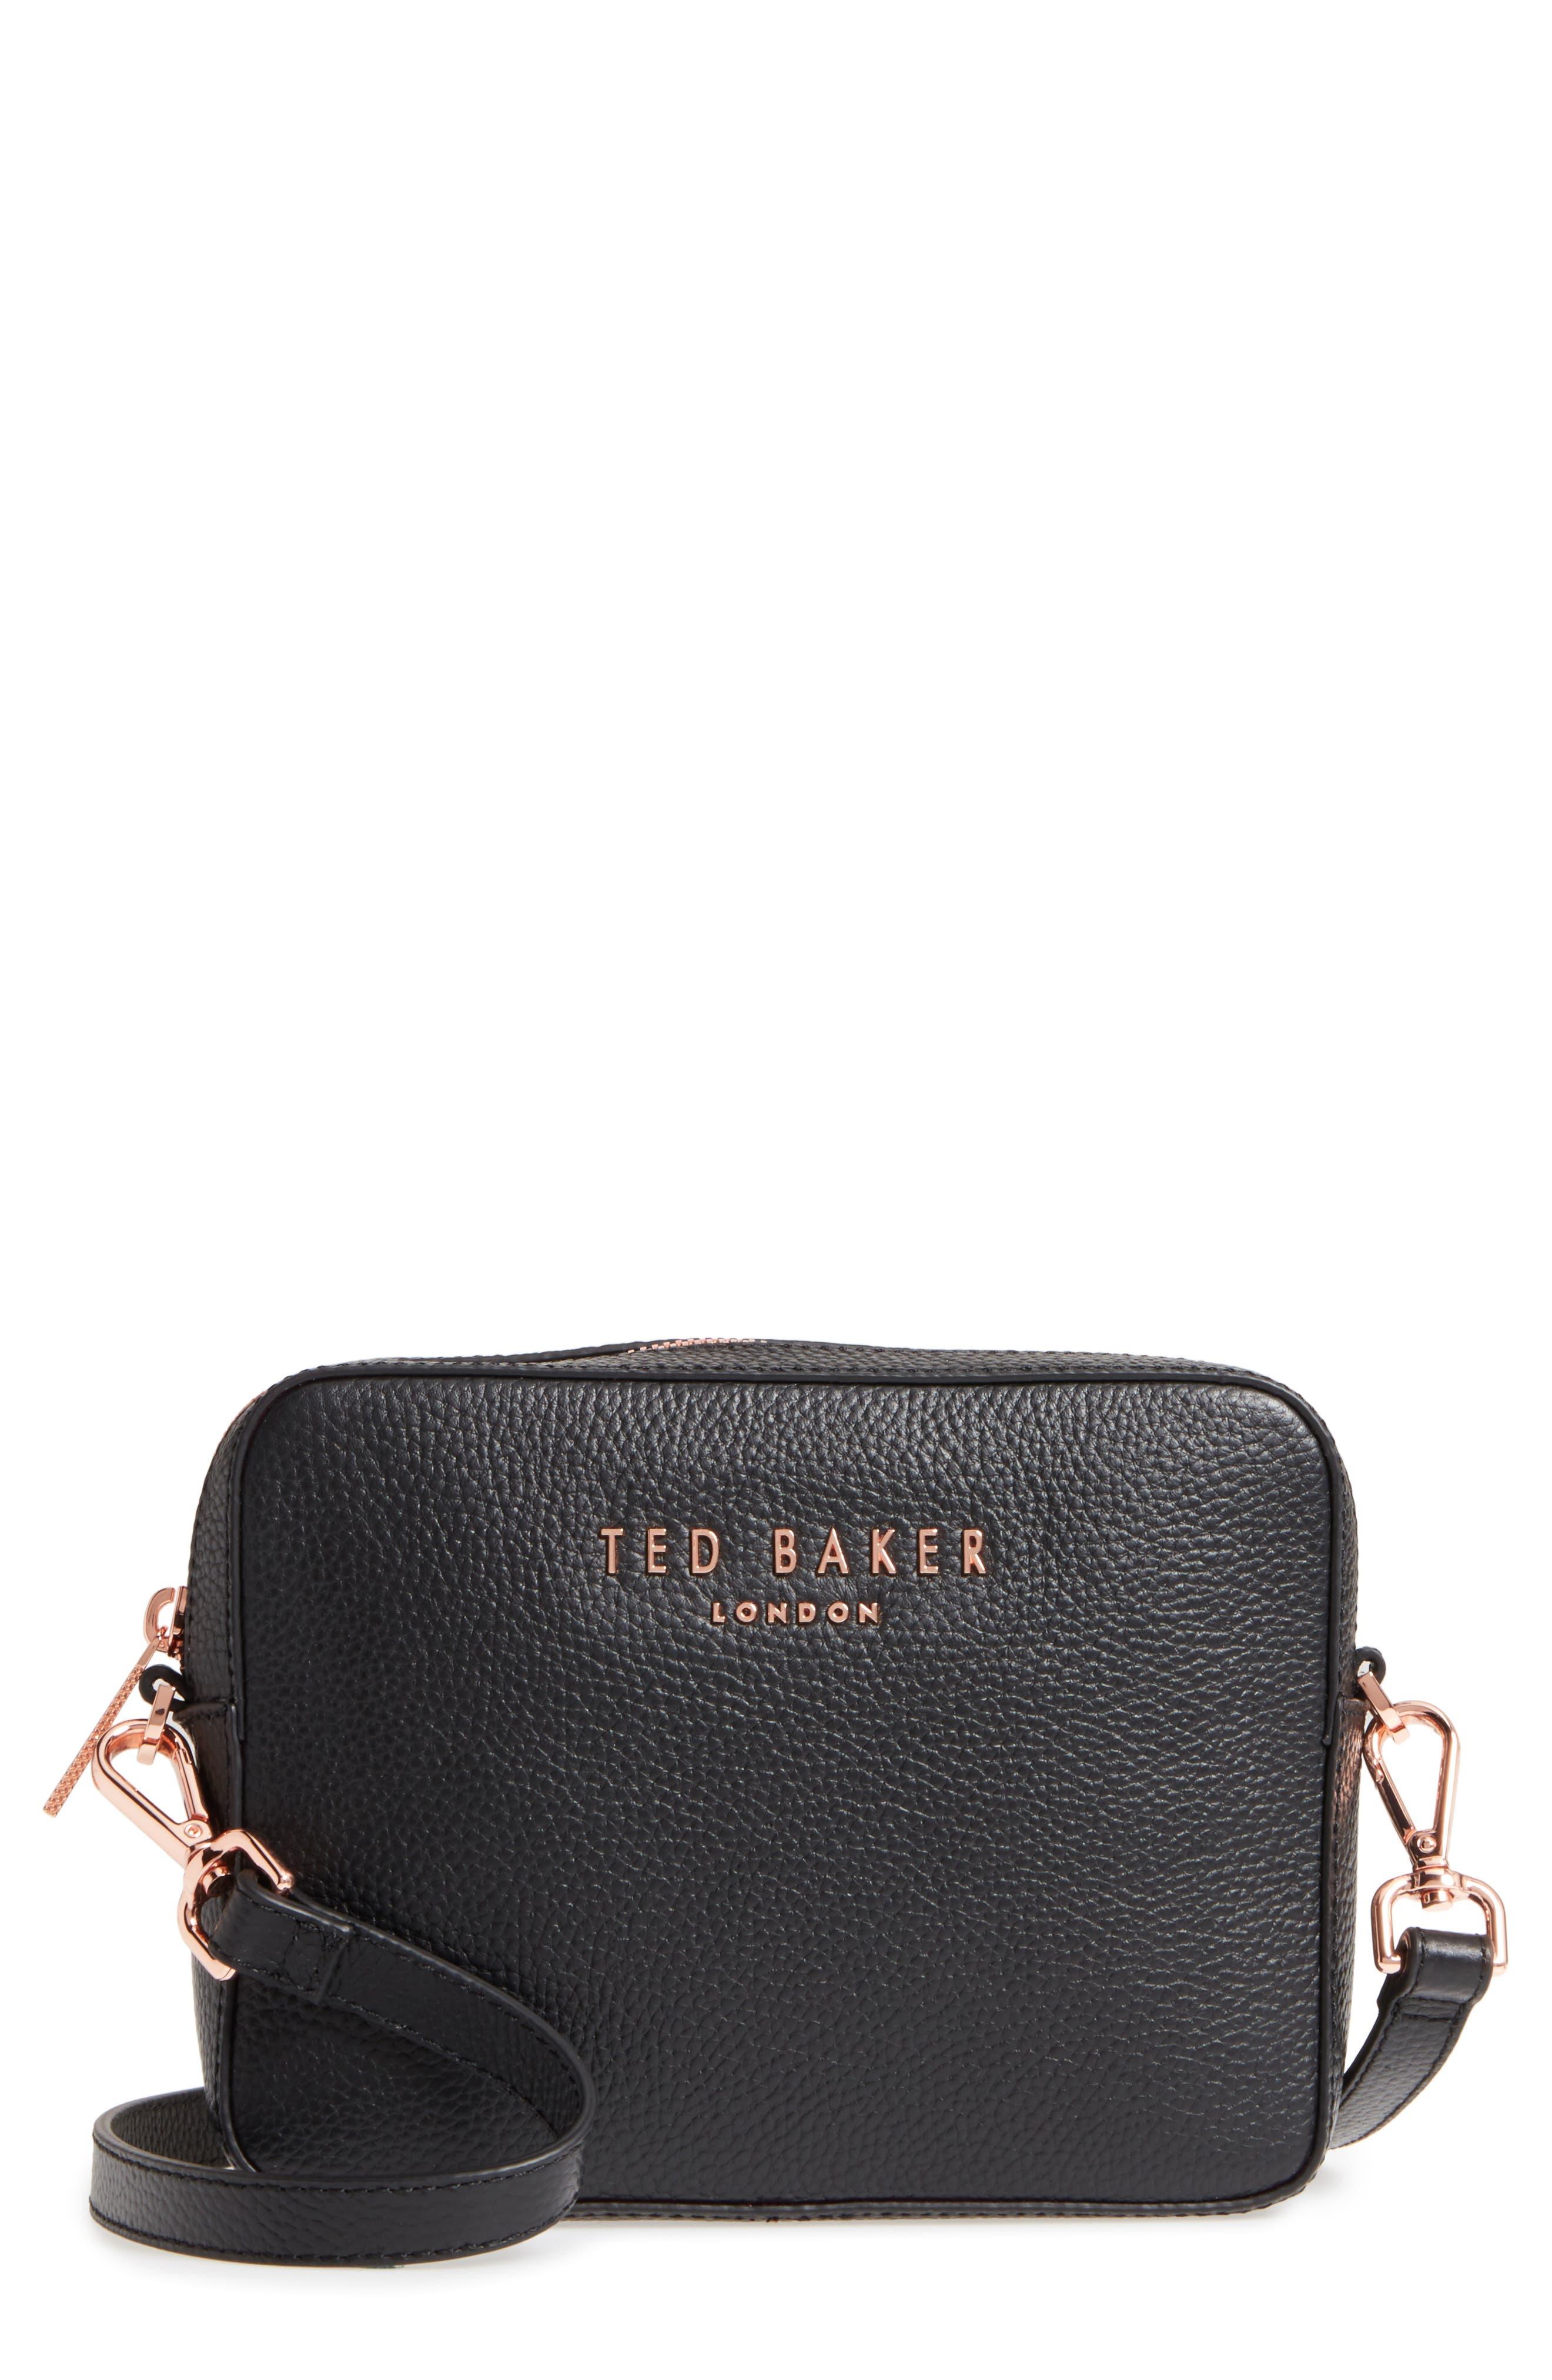 Main Image - Ted Baker London Susi Leather Crossbody Bag